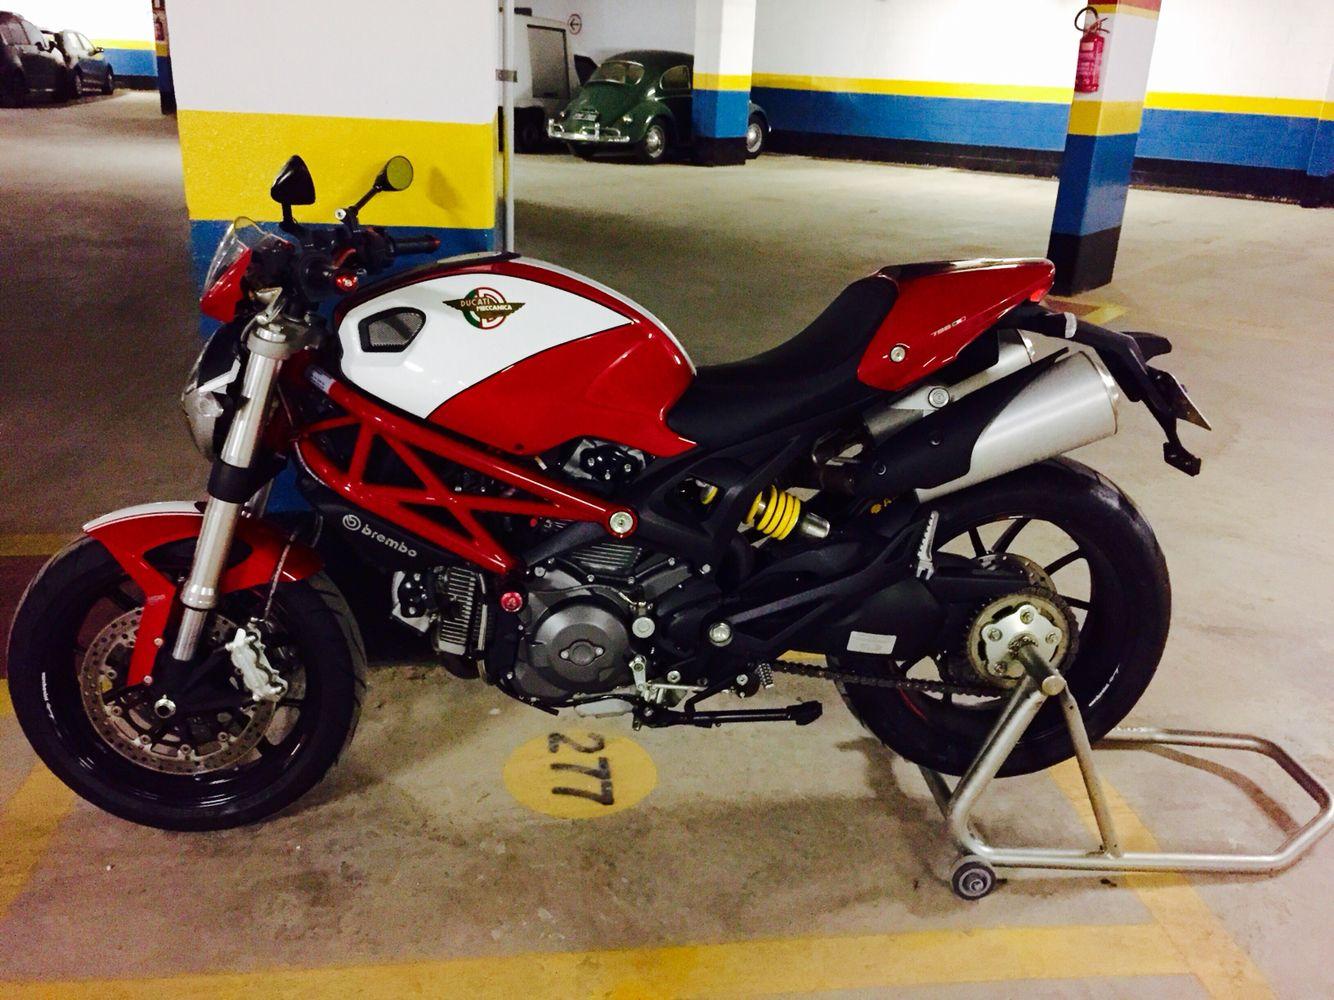 monster 796 - monster art mach1 - ducati meccanica | motorcycles